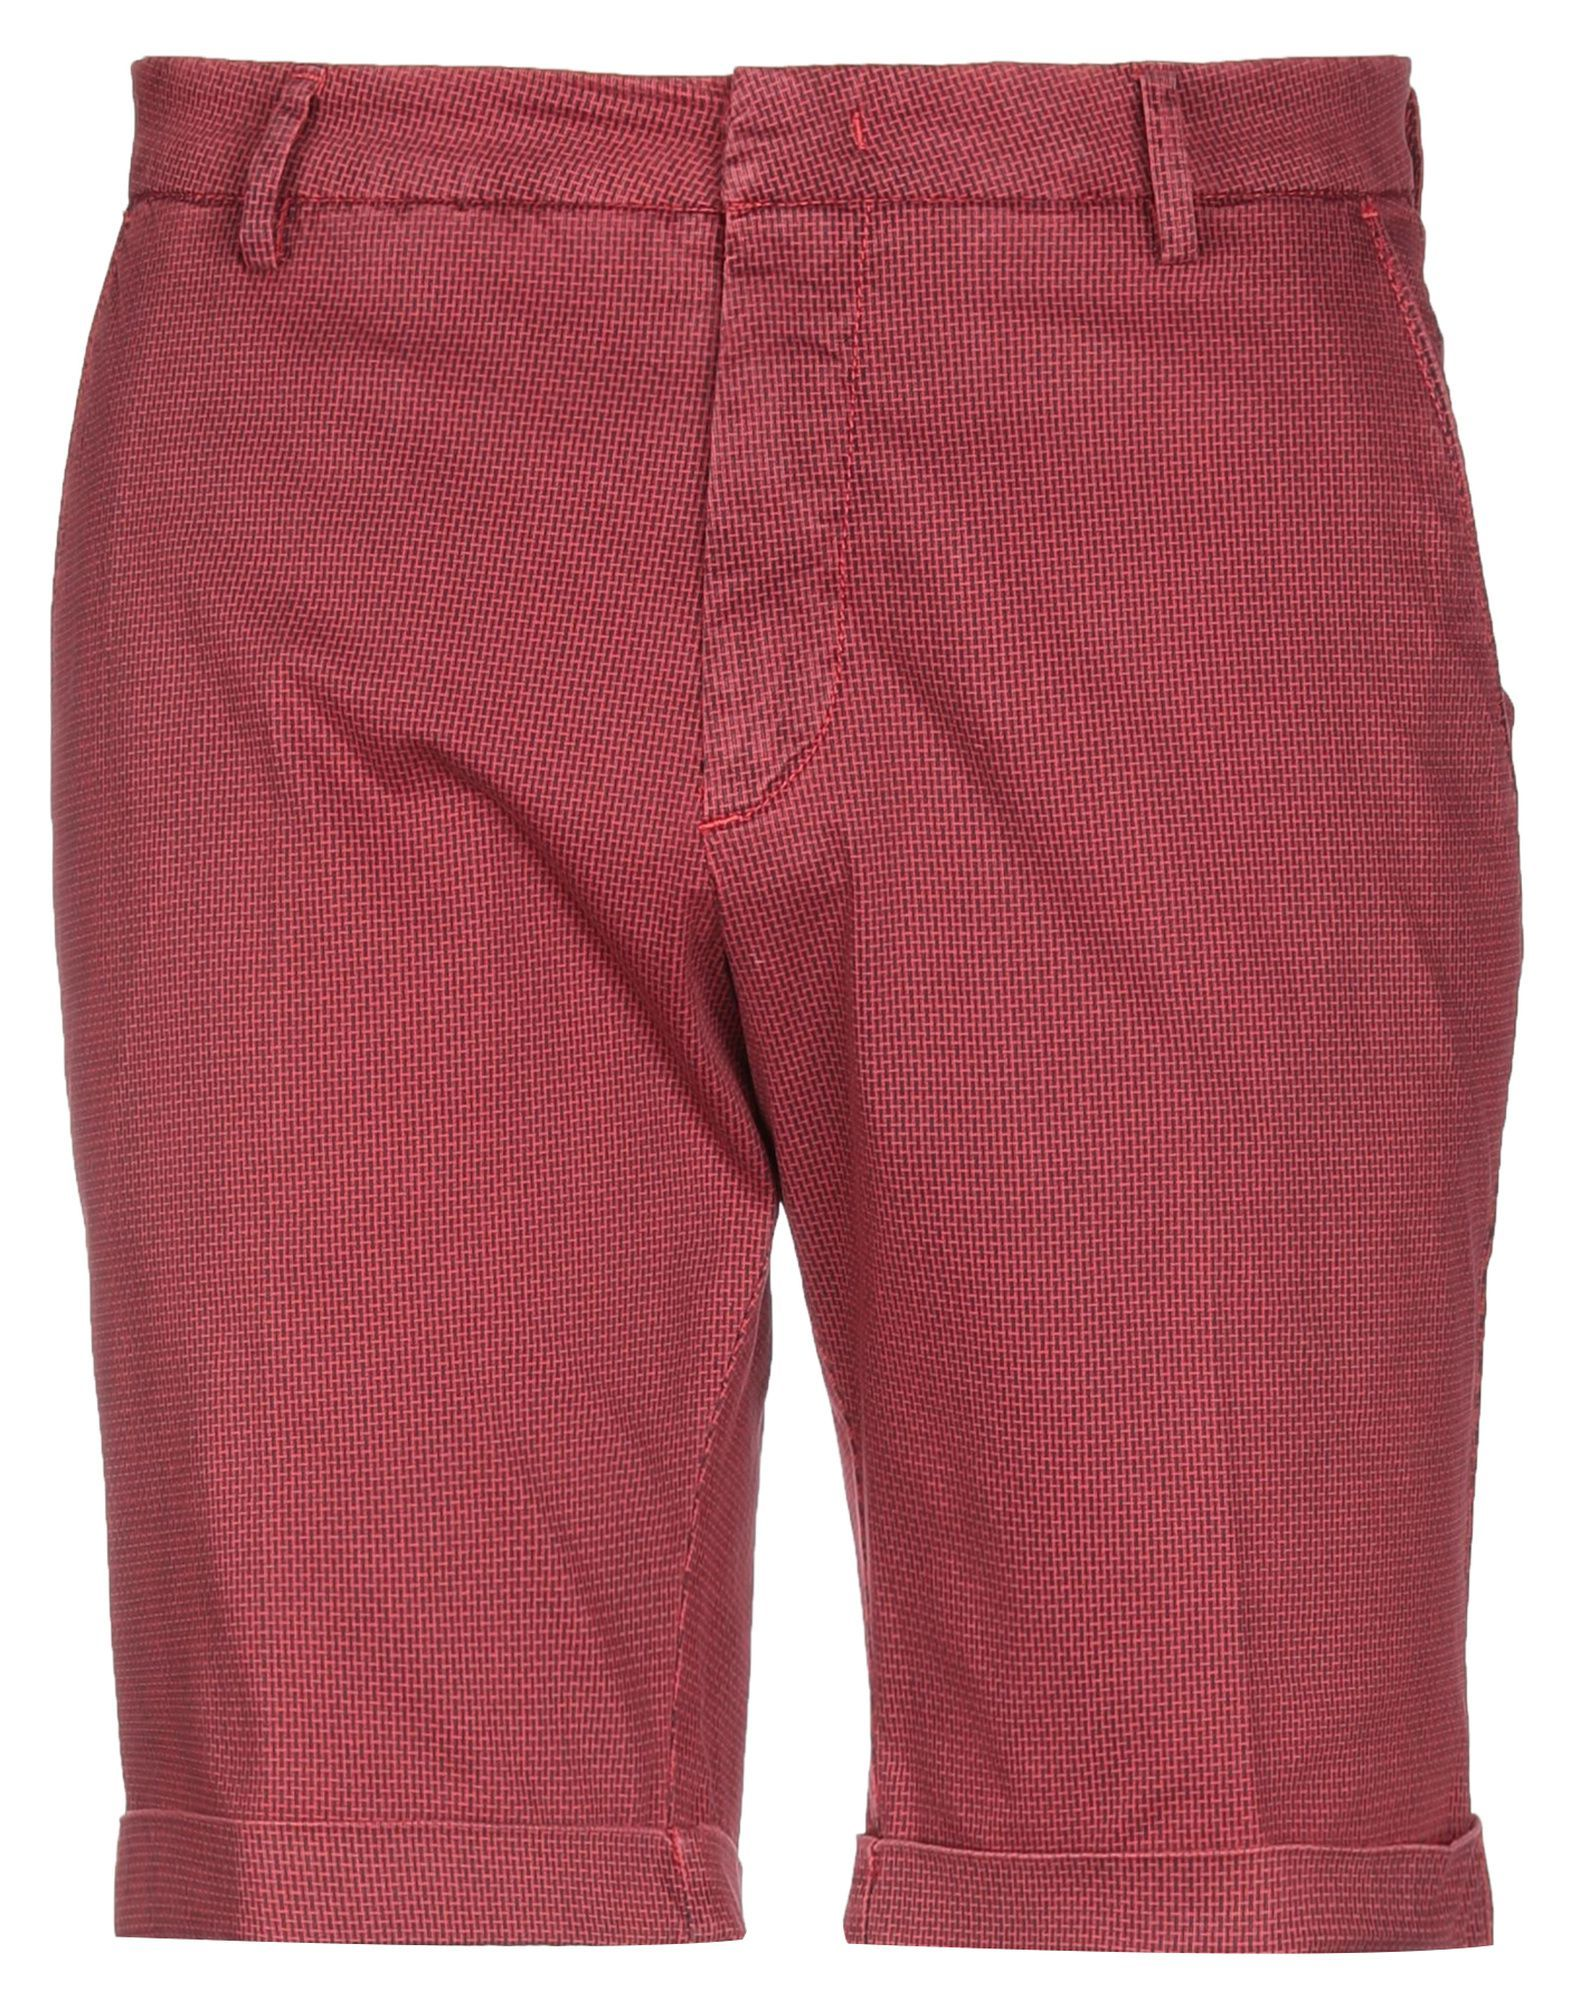 Michael Coal Red Cotton Shorts